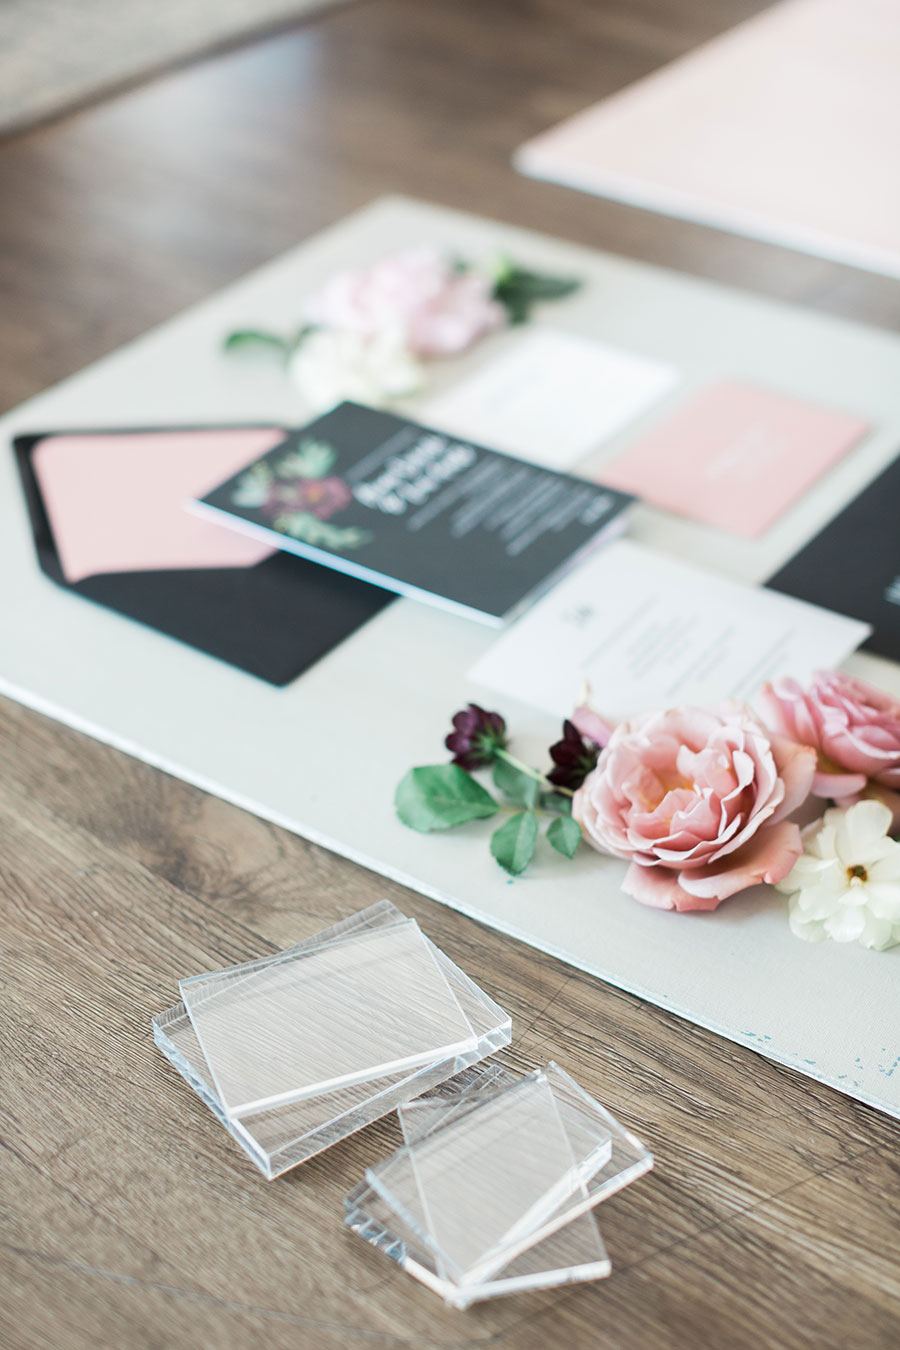 sourced-co-lvl-academy-wedding-planner-workshop-5.jpg